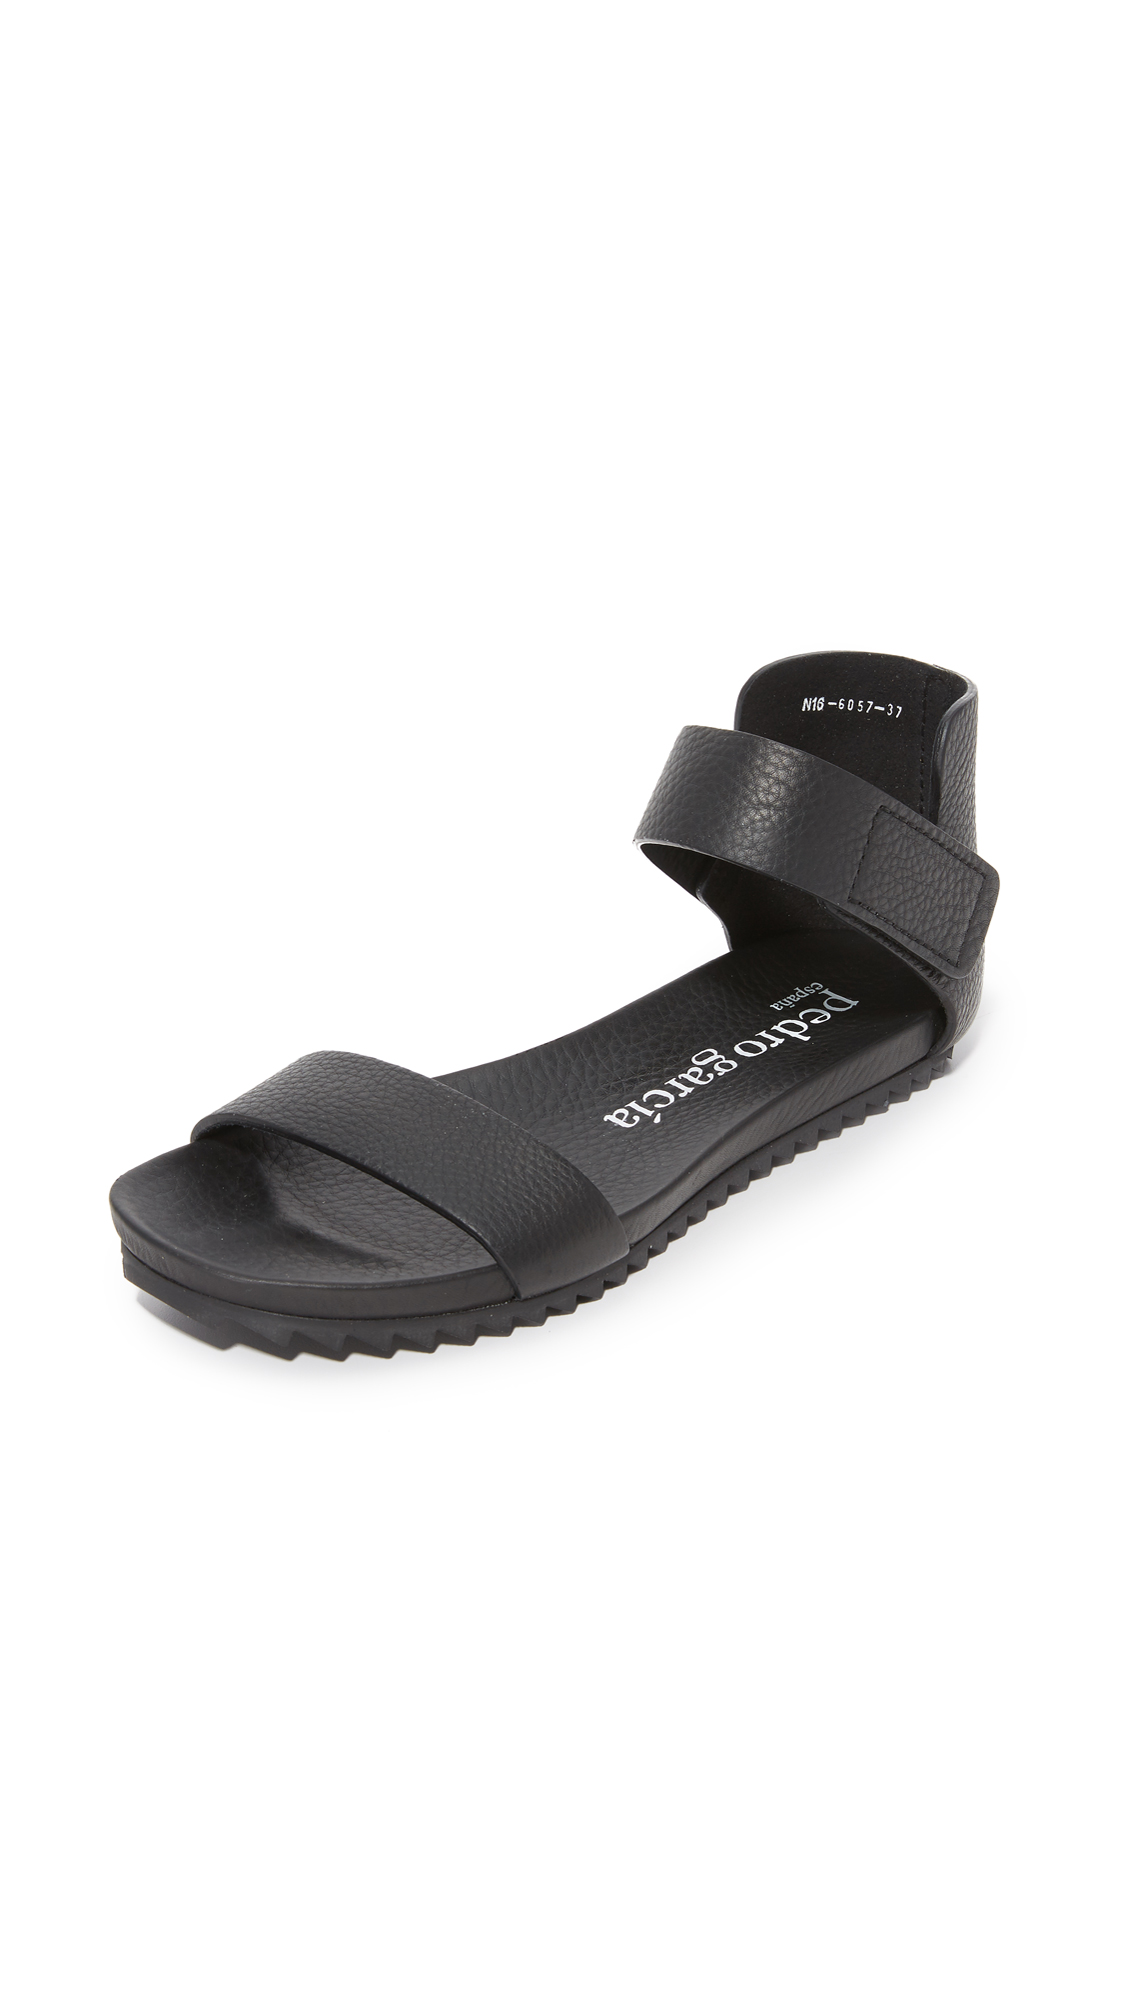 Pedro Garcia Juncal Flat Sandals - Black